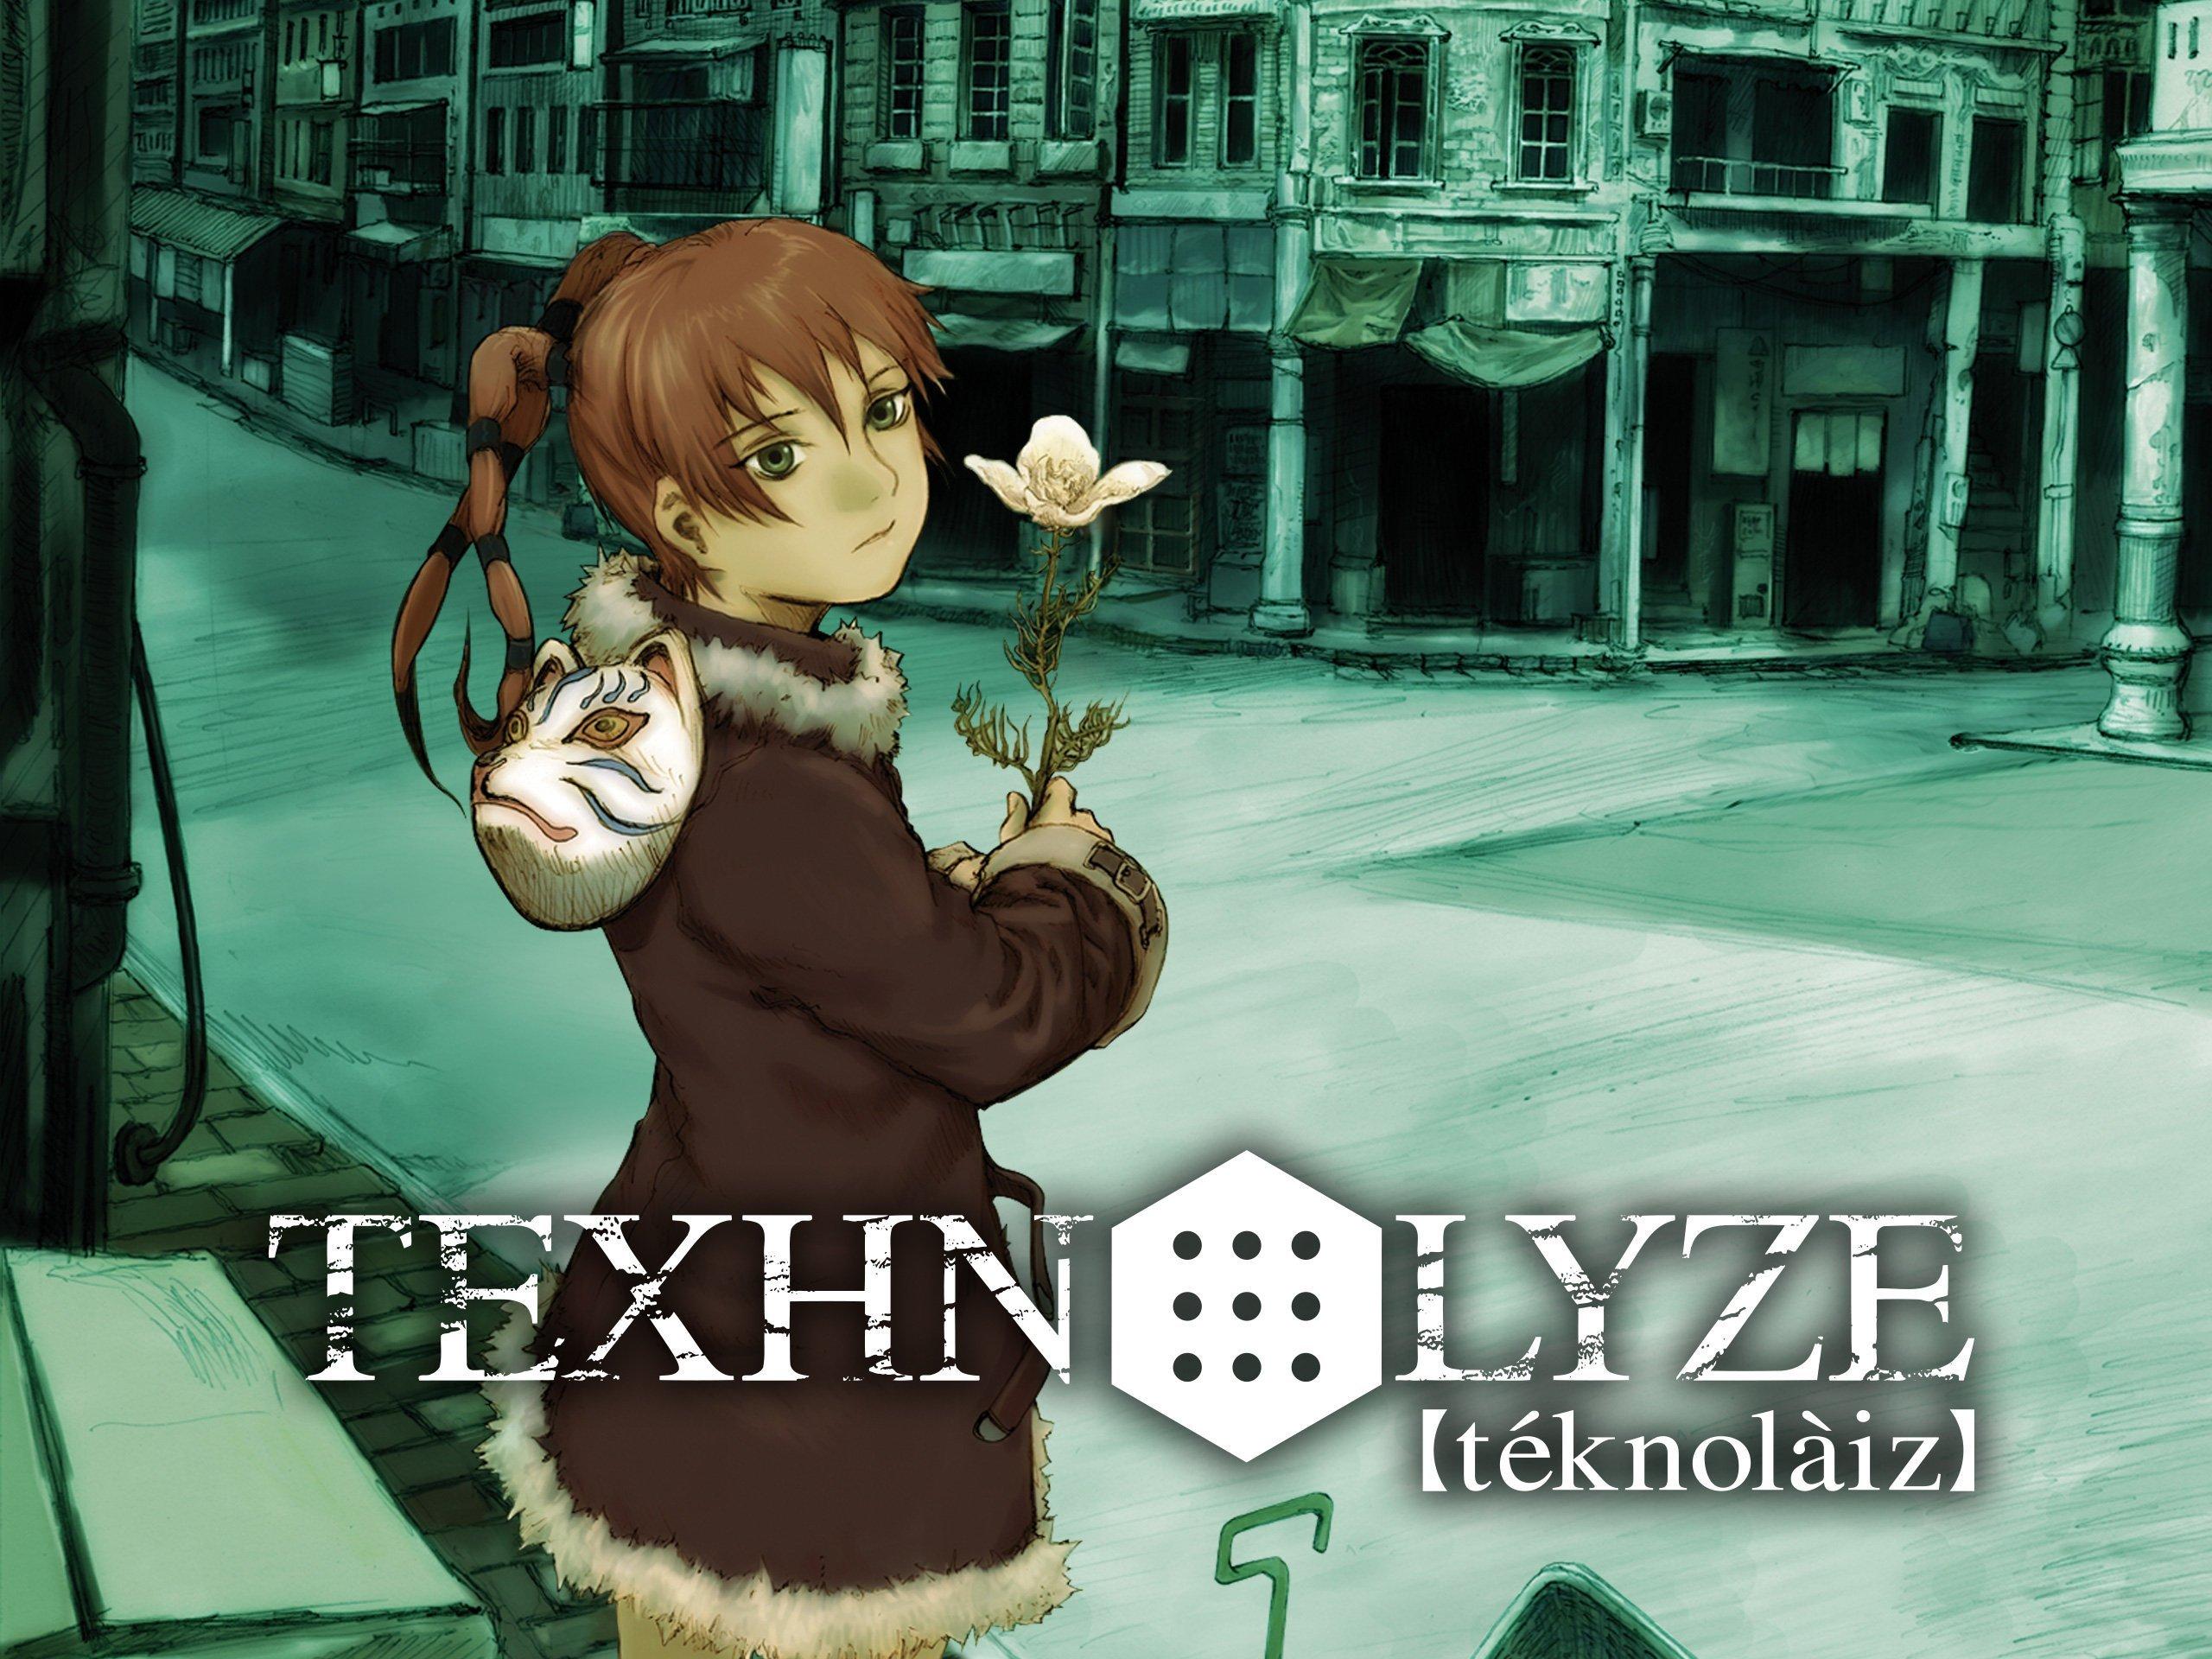 Texhnolyze: Chiaki Konaka's hidden masterpiece